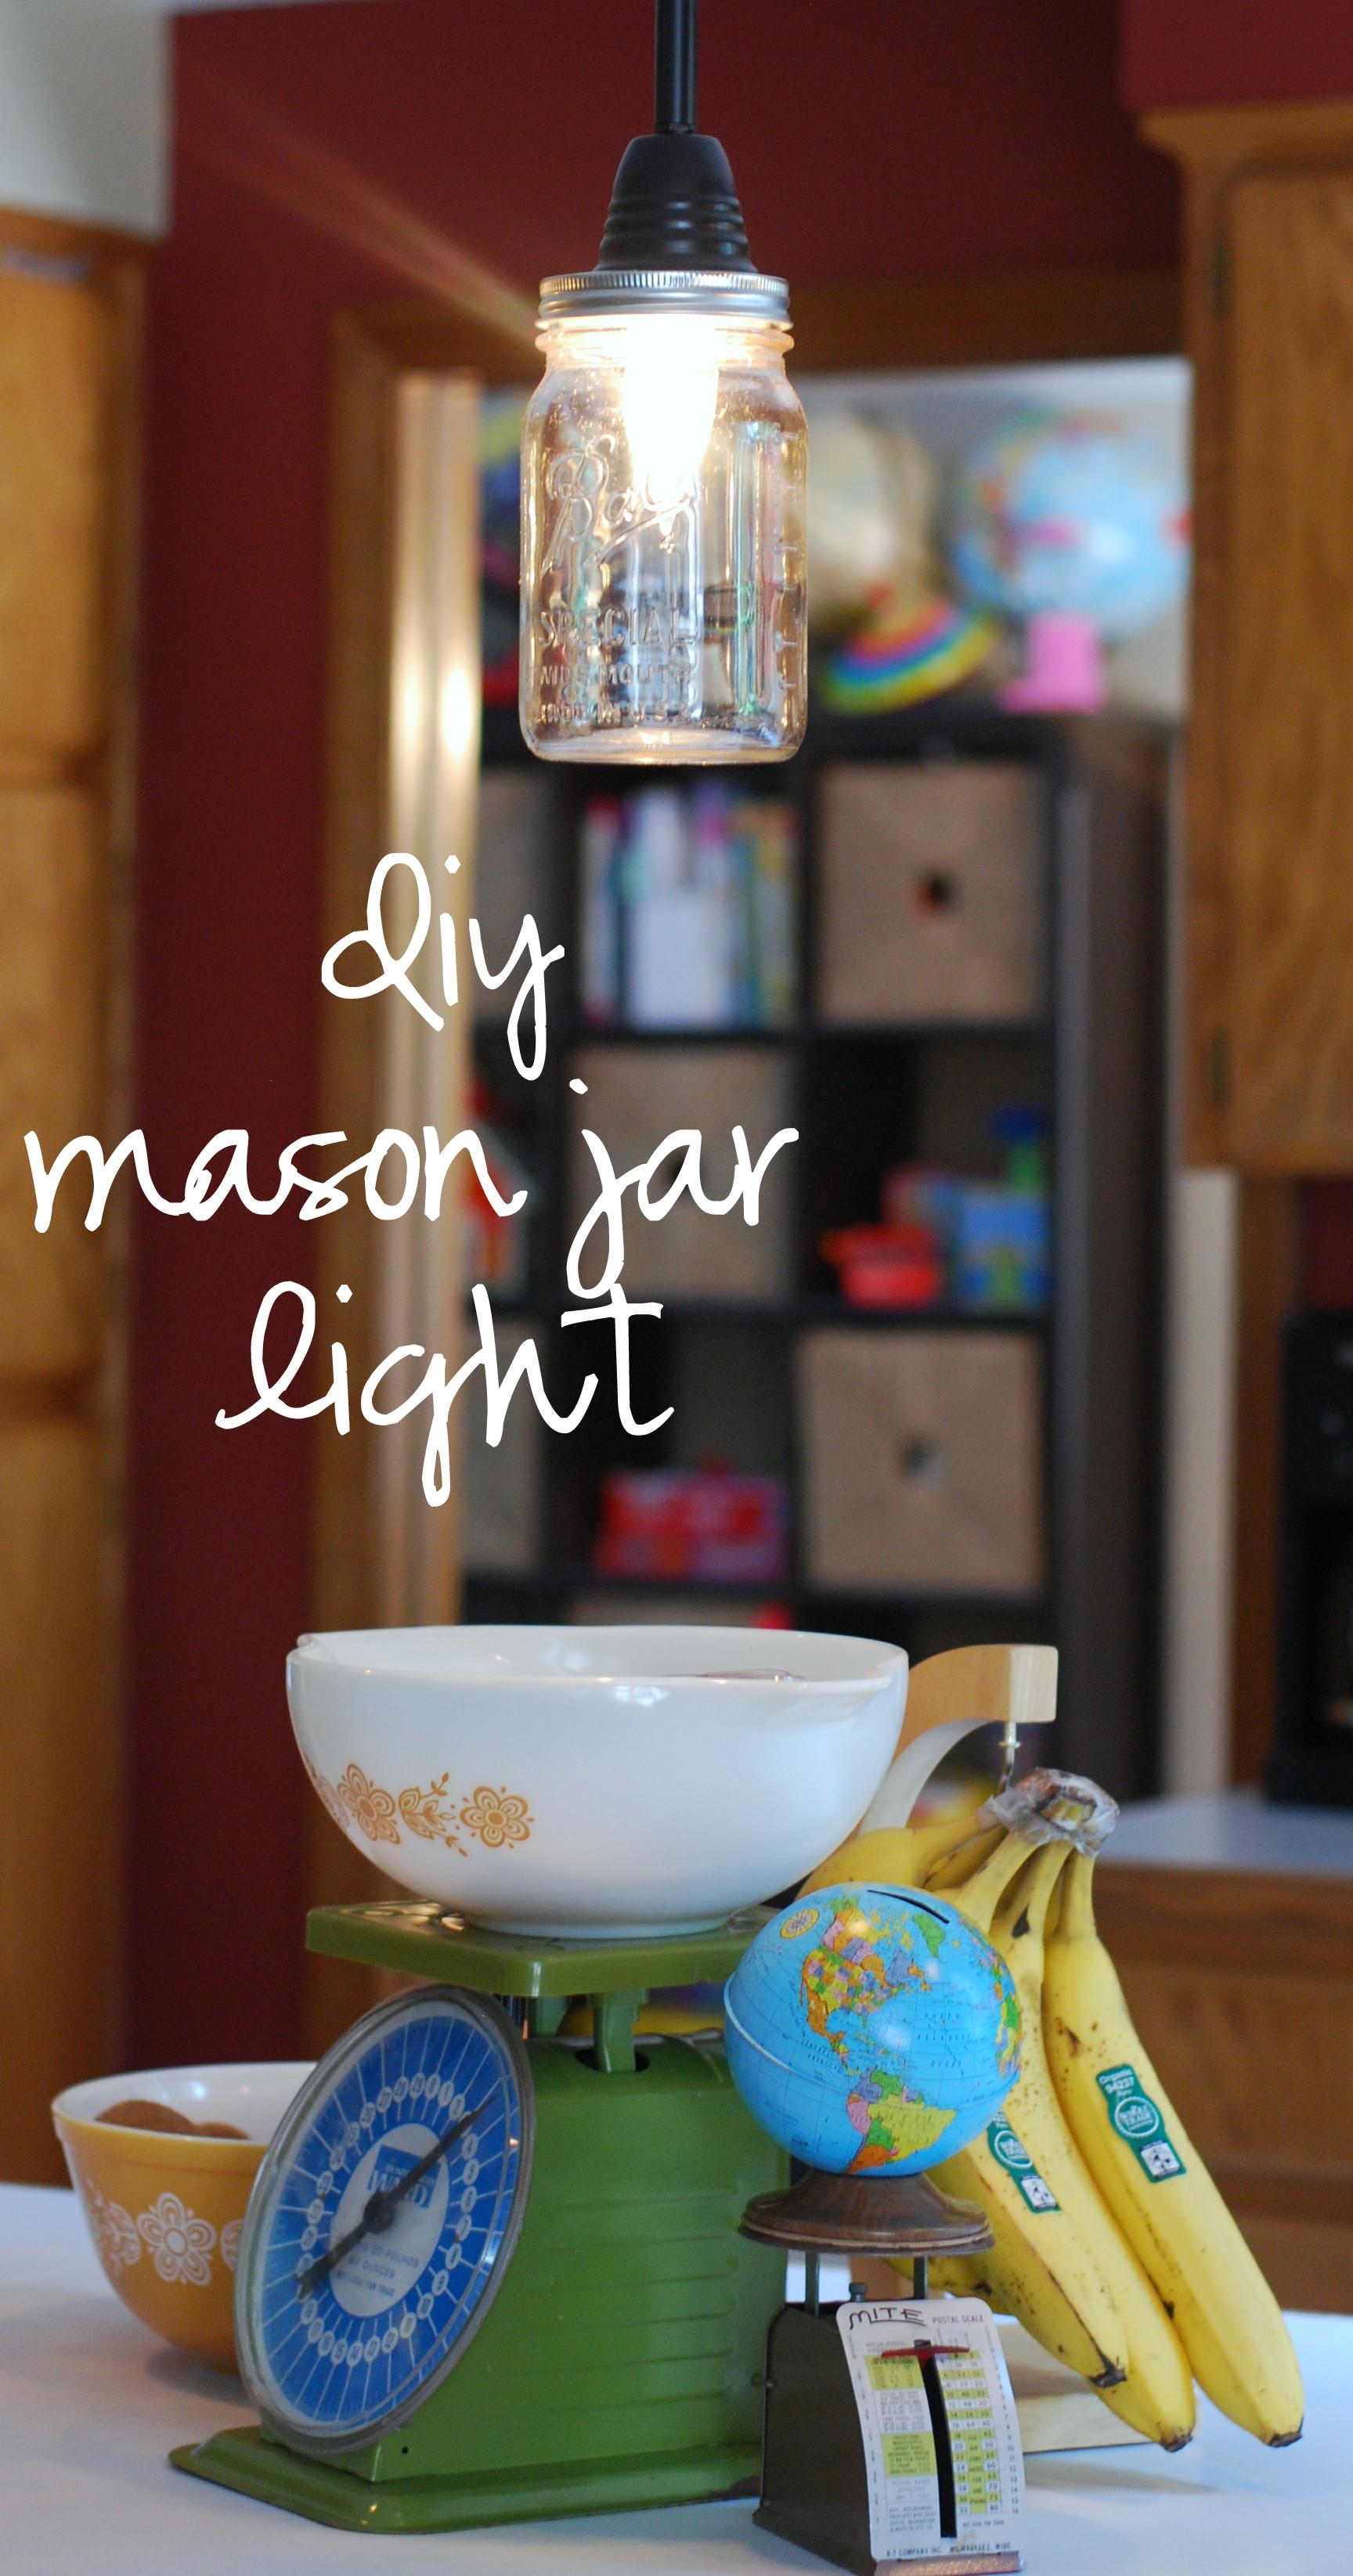 Best ideas about Mason Jar Lights DIY . Save or Pin diy mason jar pendant light Now.